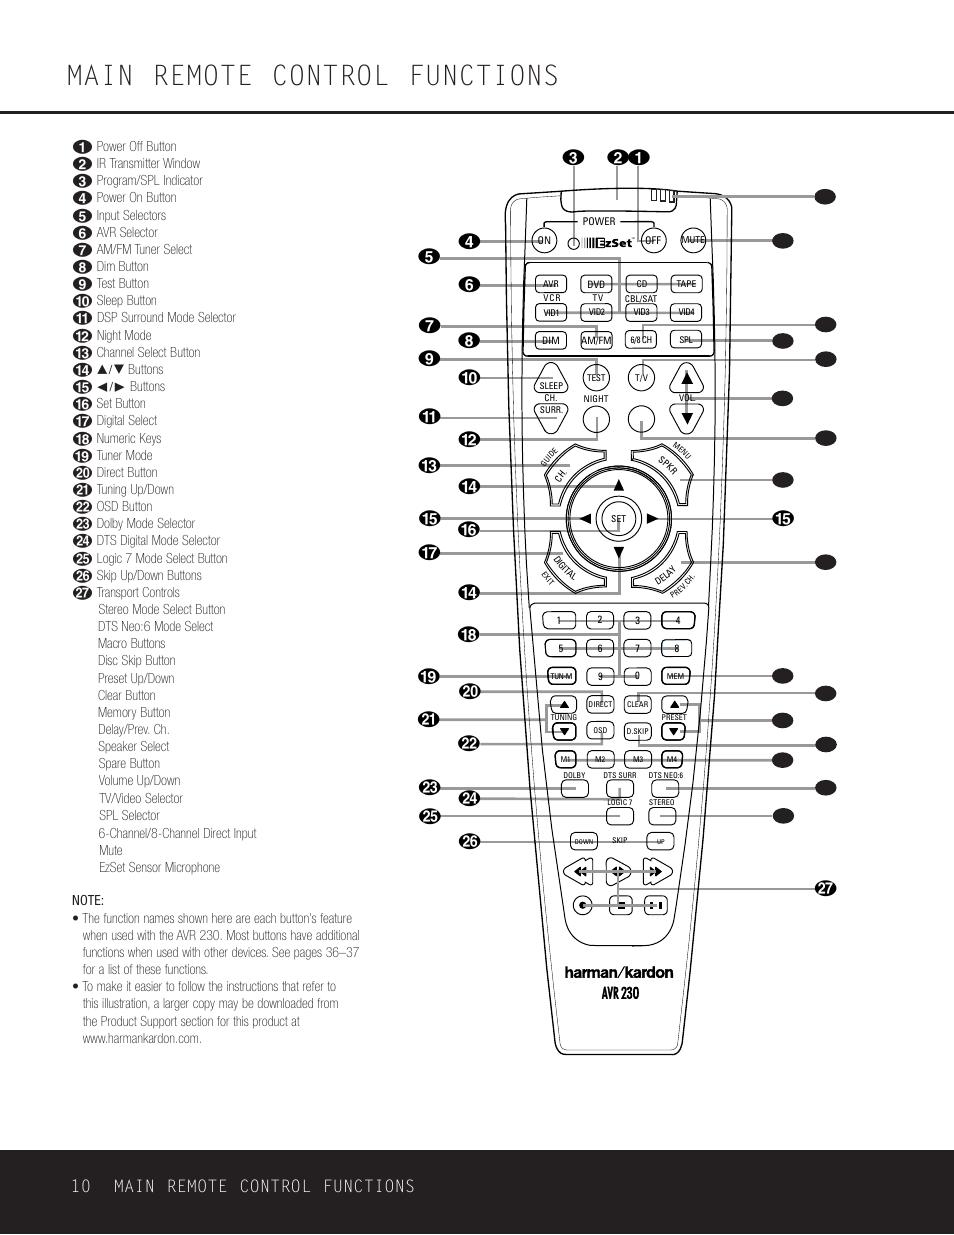 Main remote control functions, 10 main remote control